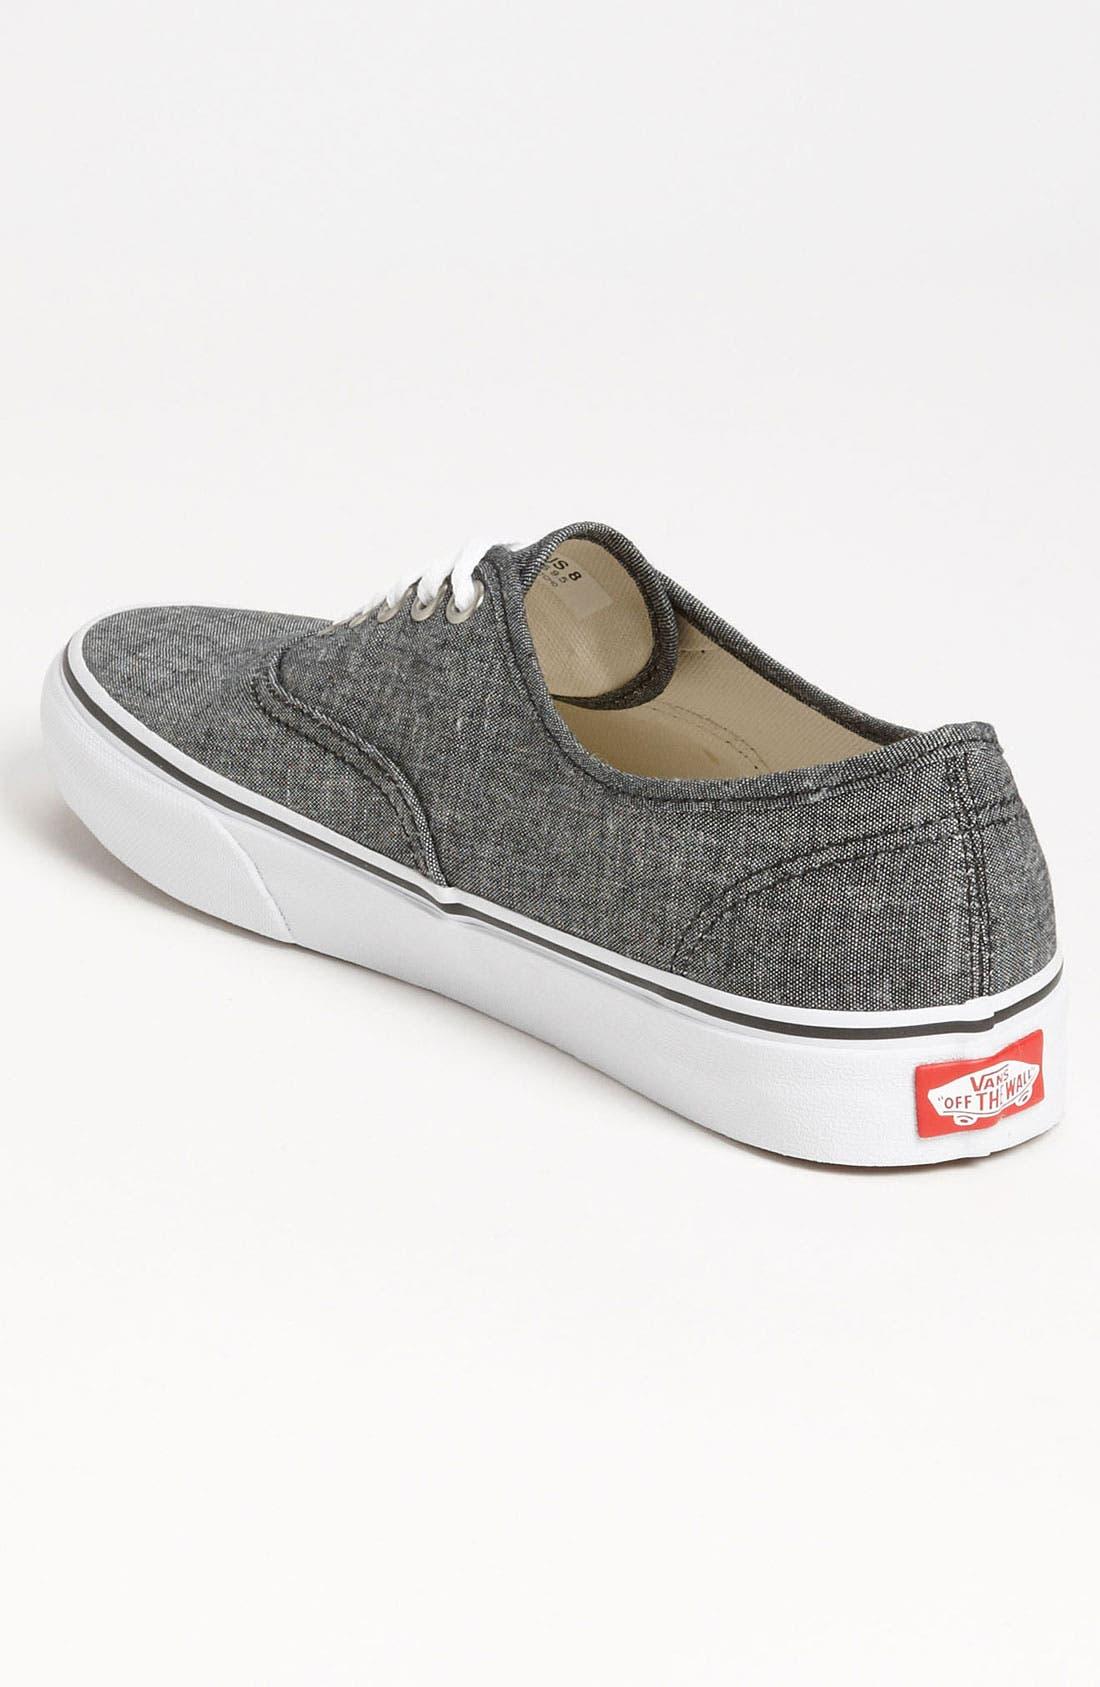 Alternate Image 2  - Vans 'Authentic' Sneaker (Men)